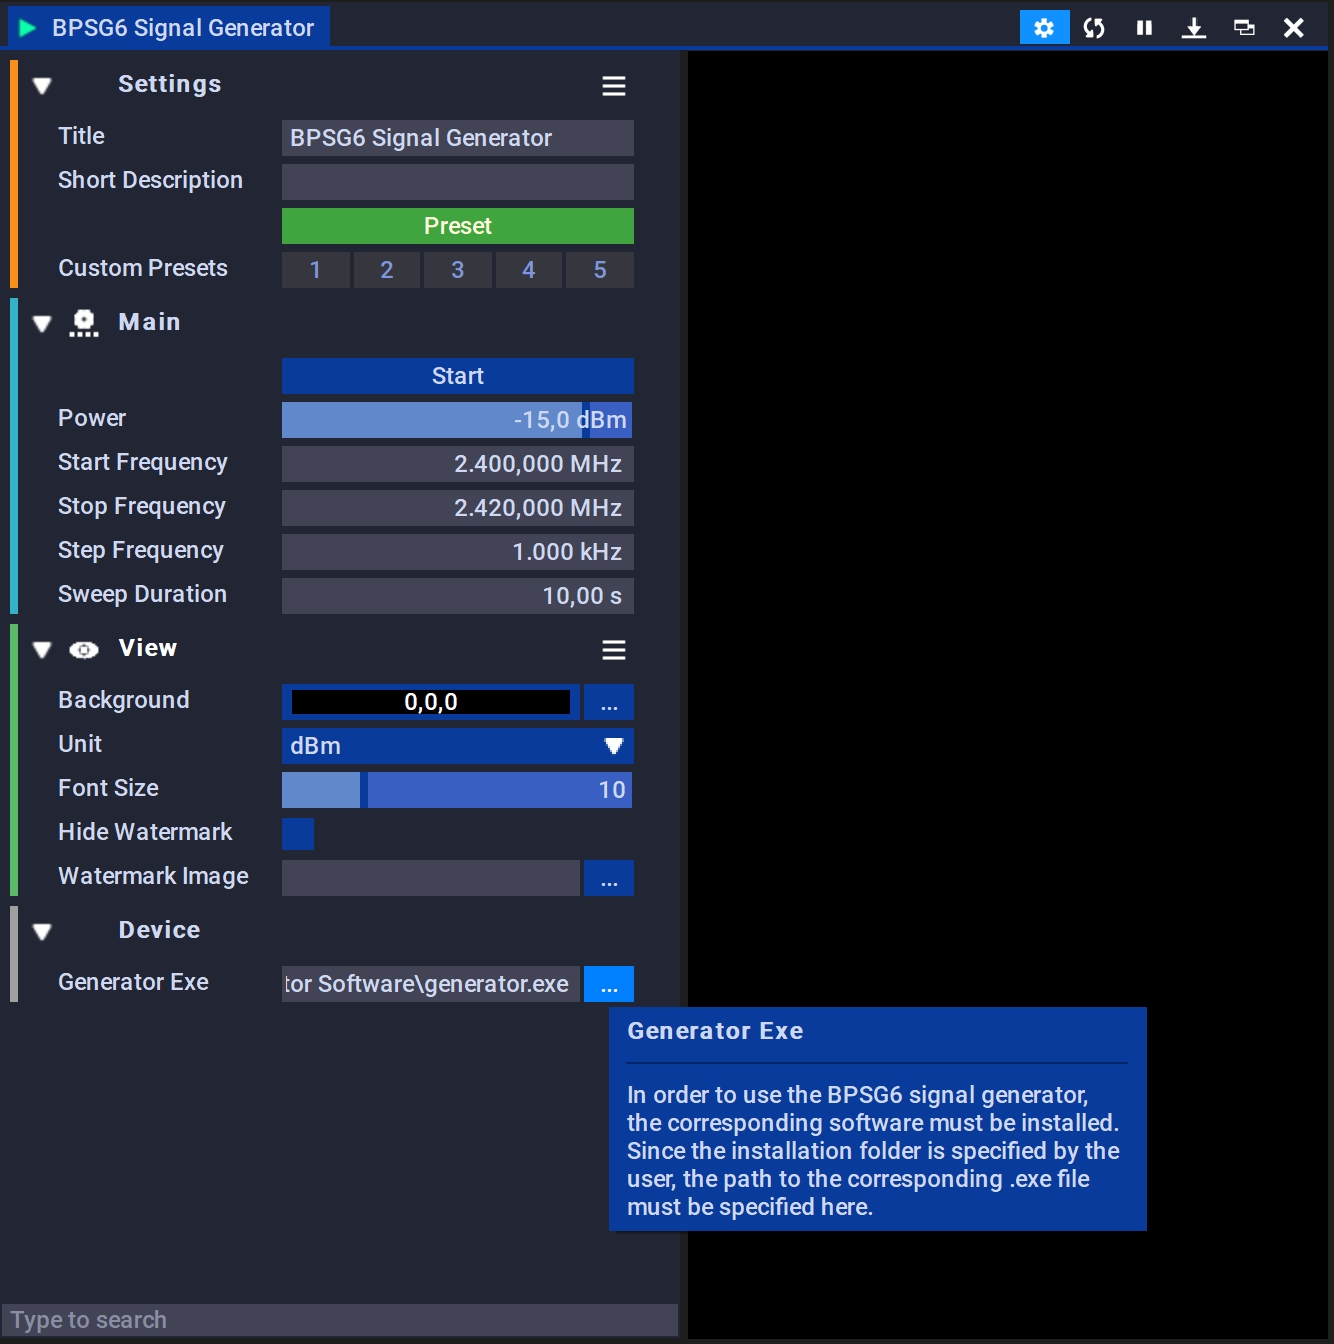 BPSG6 Signal Generator | Configuration